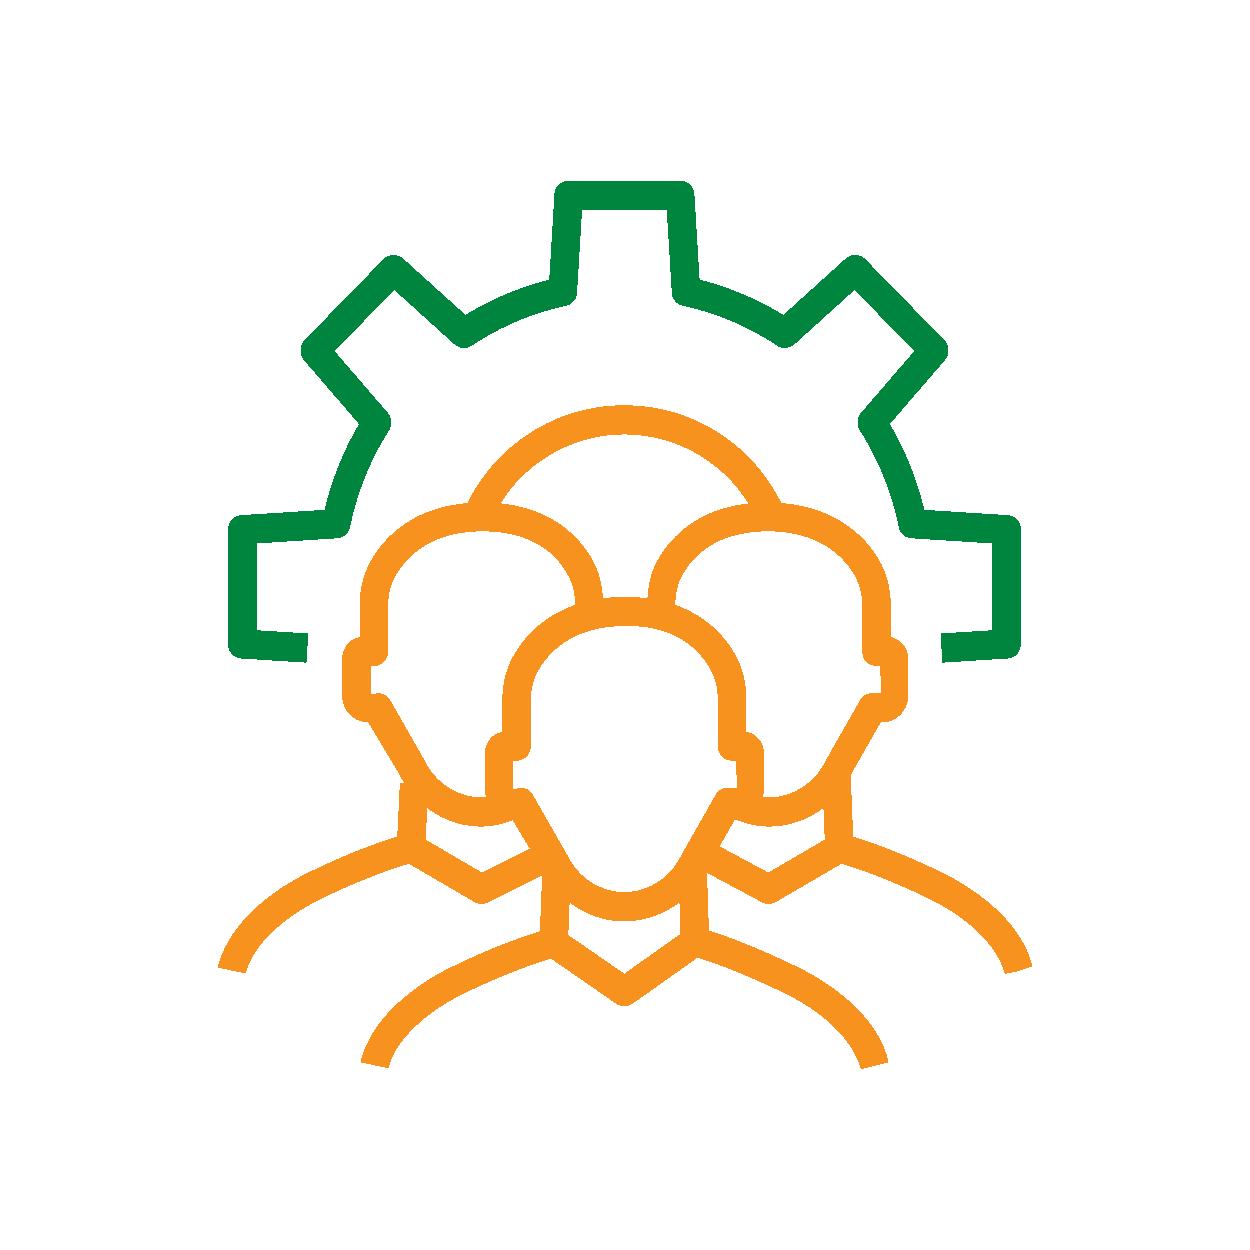 Collaboration Symbol